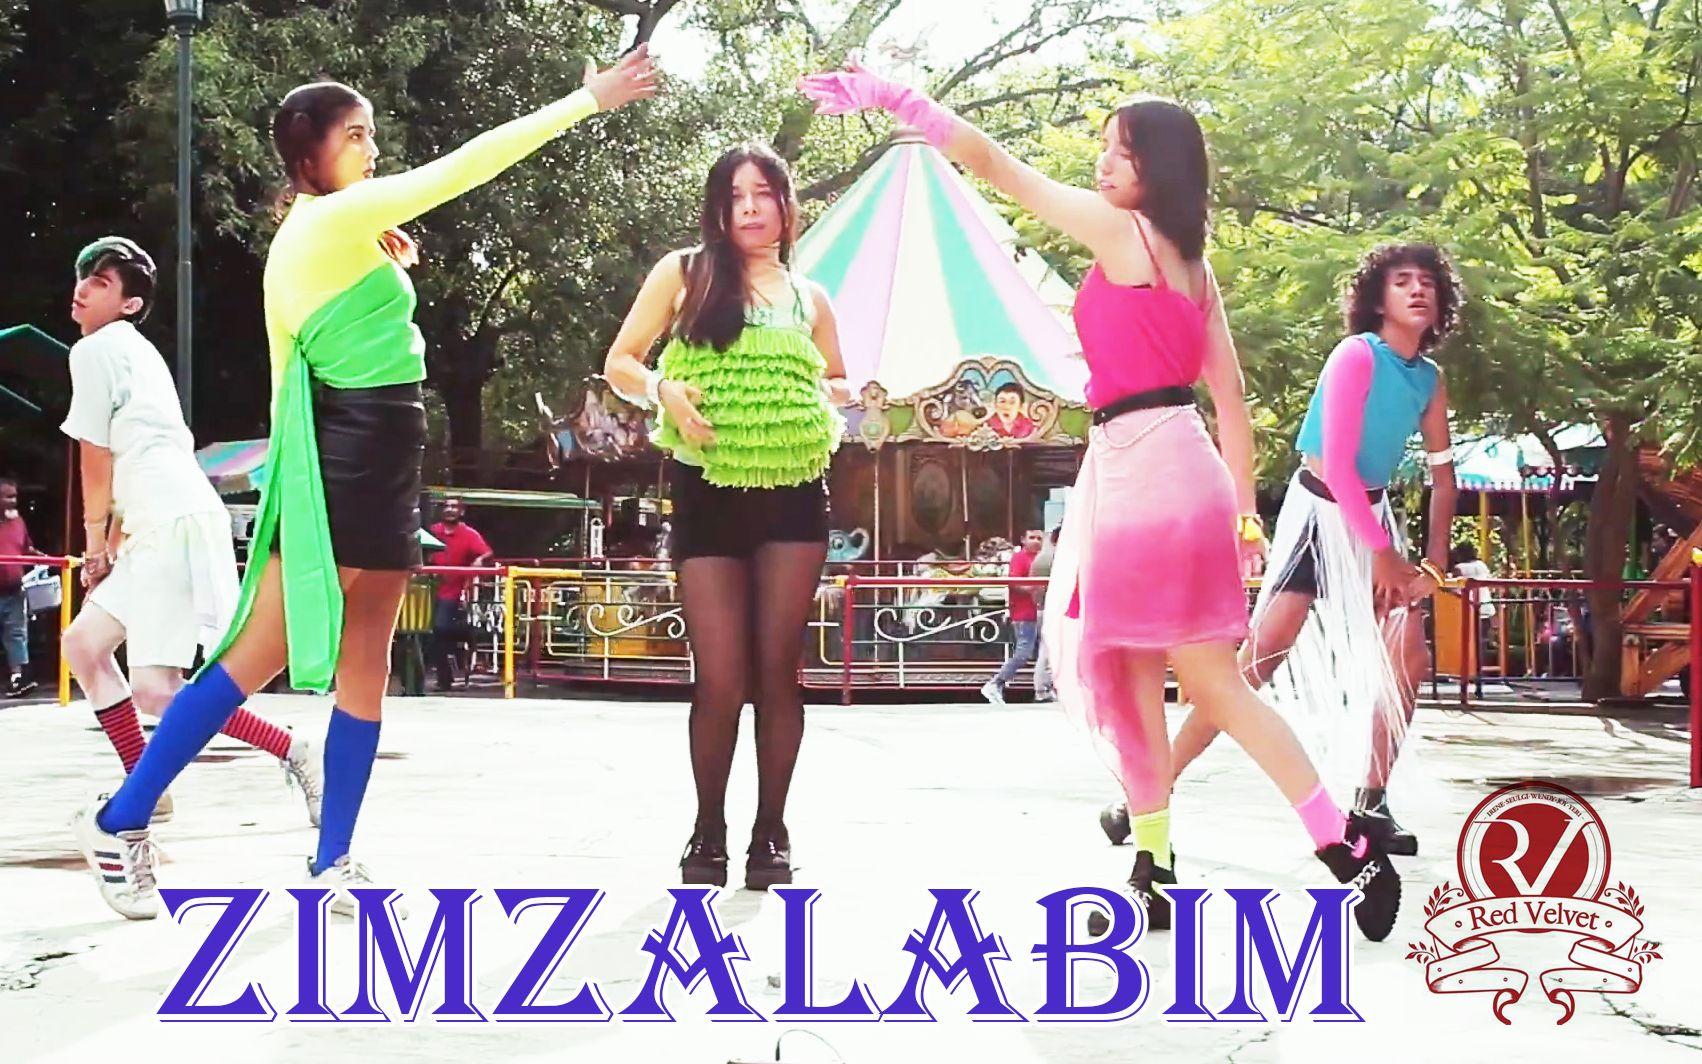 Amrotic Com 【red velvet】墨西哥舞团翻跳 zimzalabim,游乐场里跳红贝贝的曲子真是再合适不过了……_哔哩哔哩 (゜-゜)つロ  干杯~-bilibili